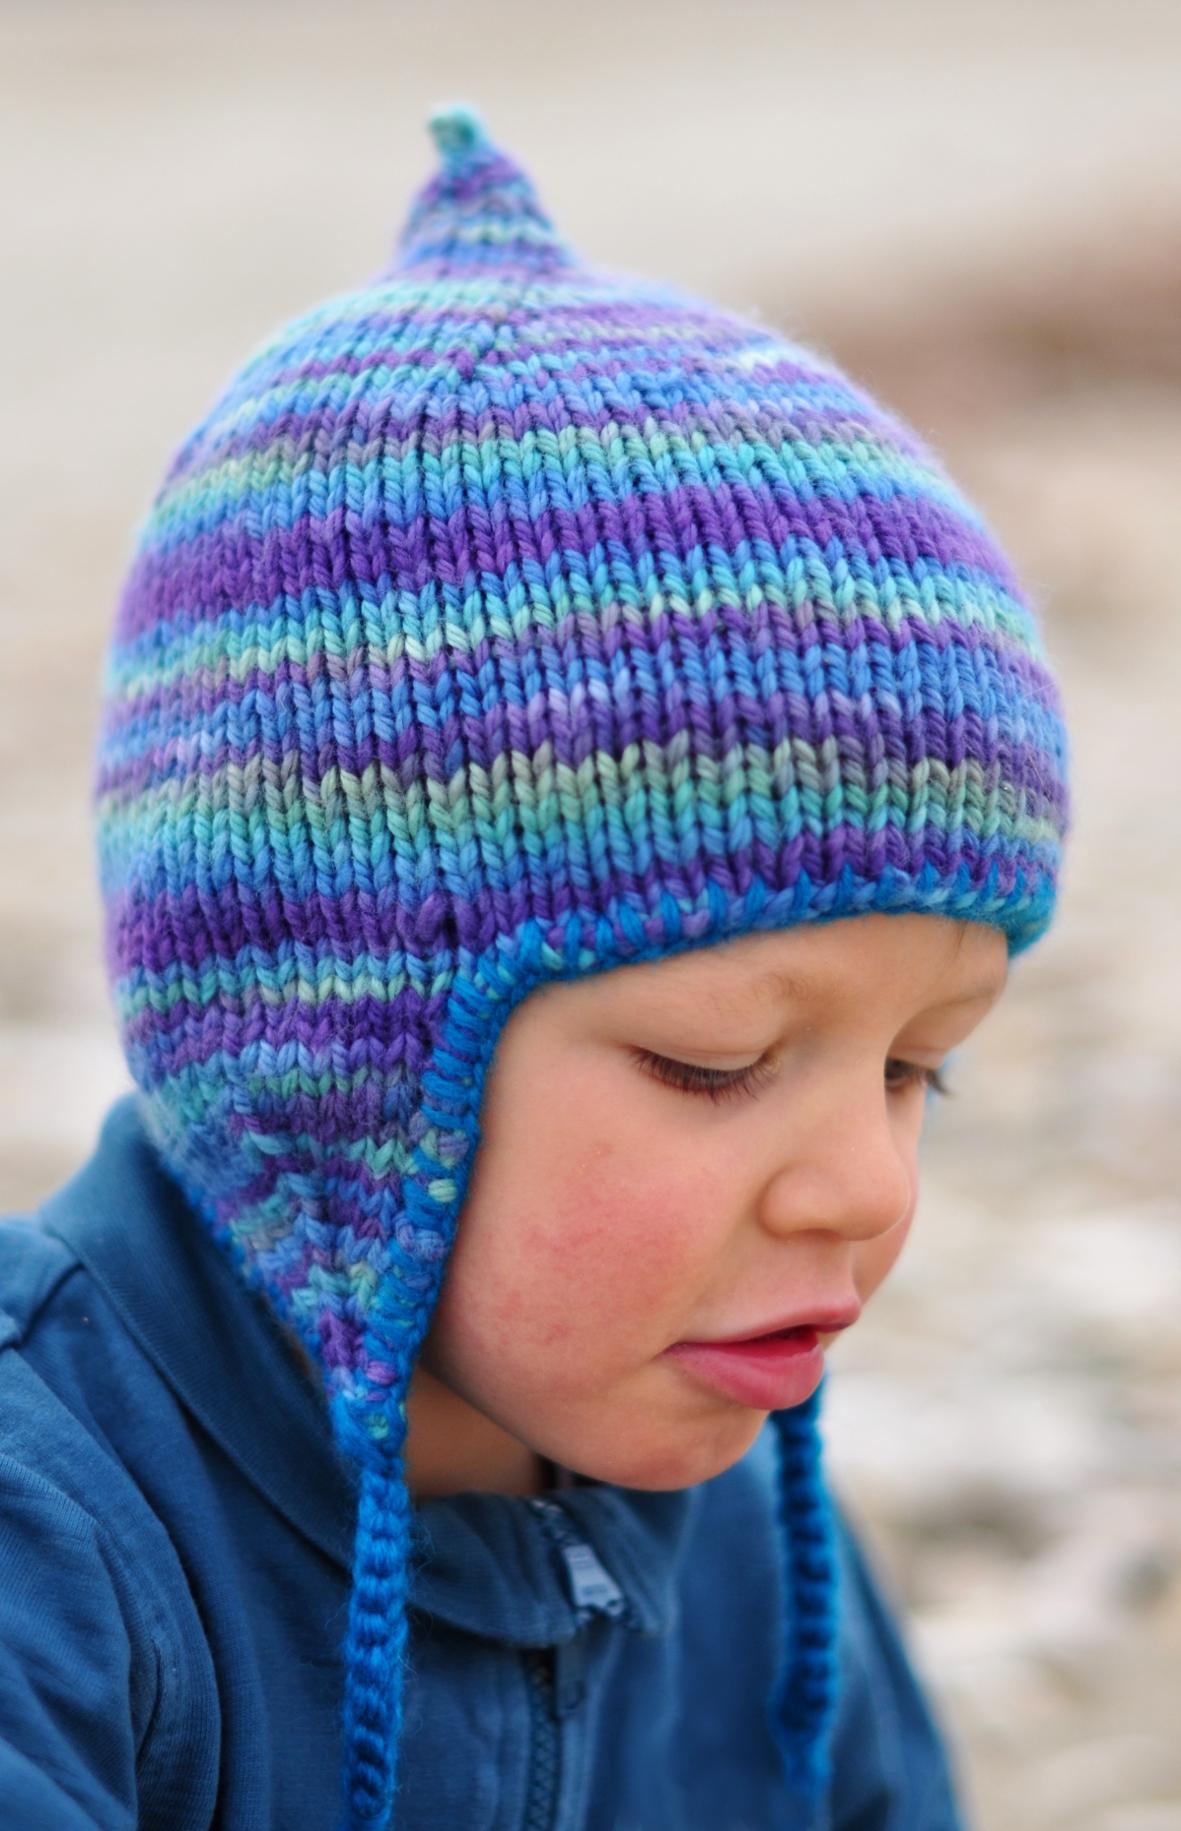 Bimple chullo pixie Hat knitting pattern